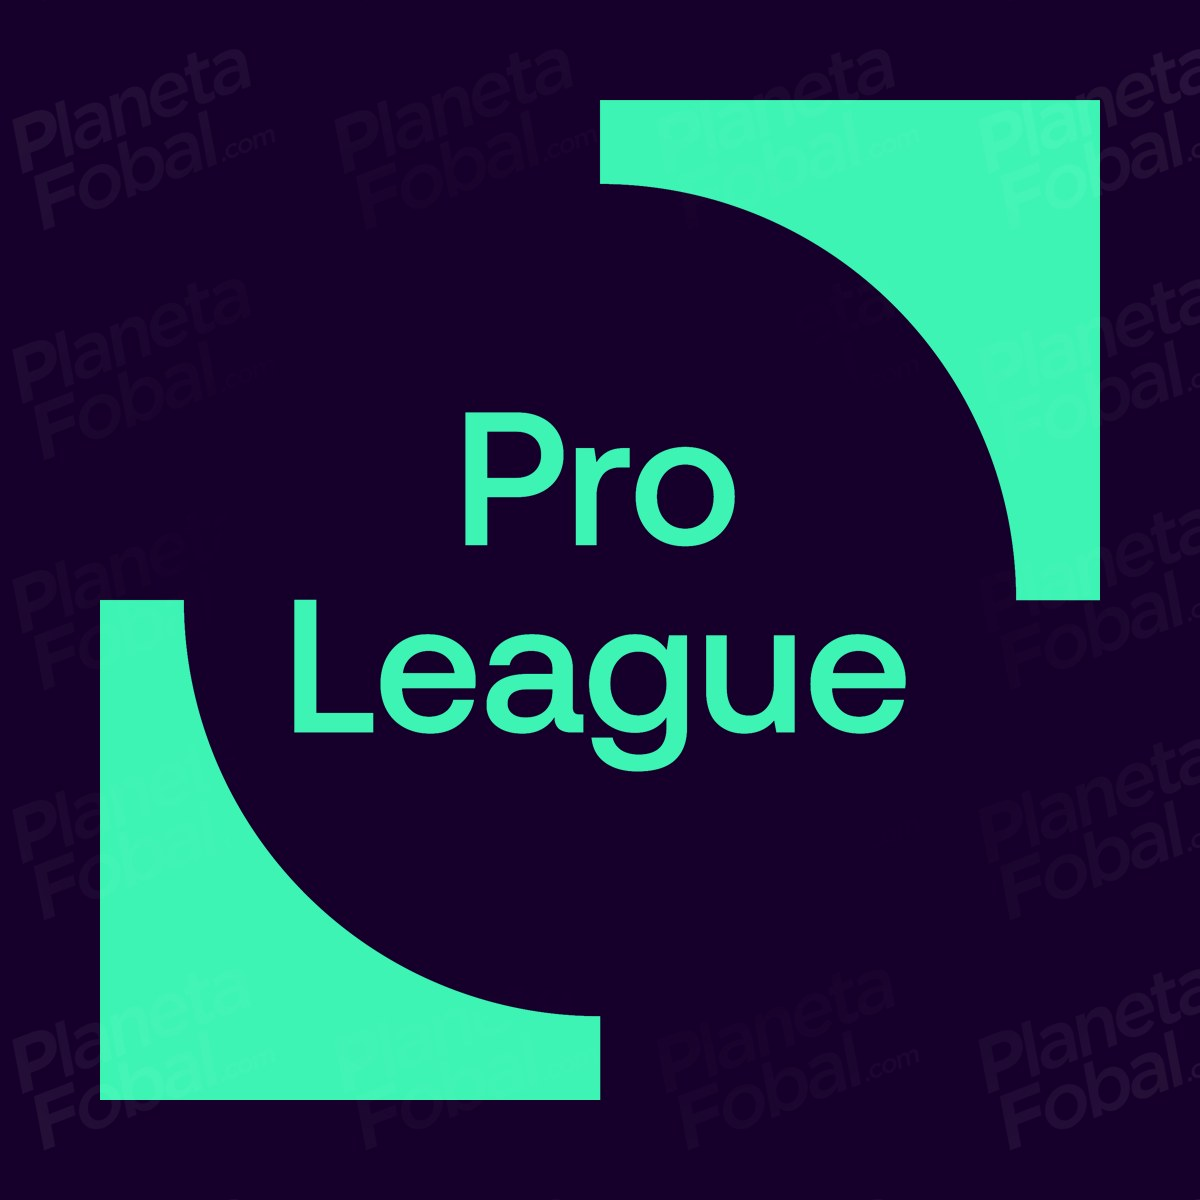 Logo secundario de la Pro League de Bélgica | Imagen Web Oficial